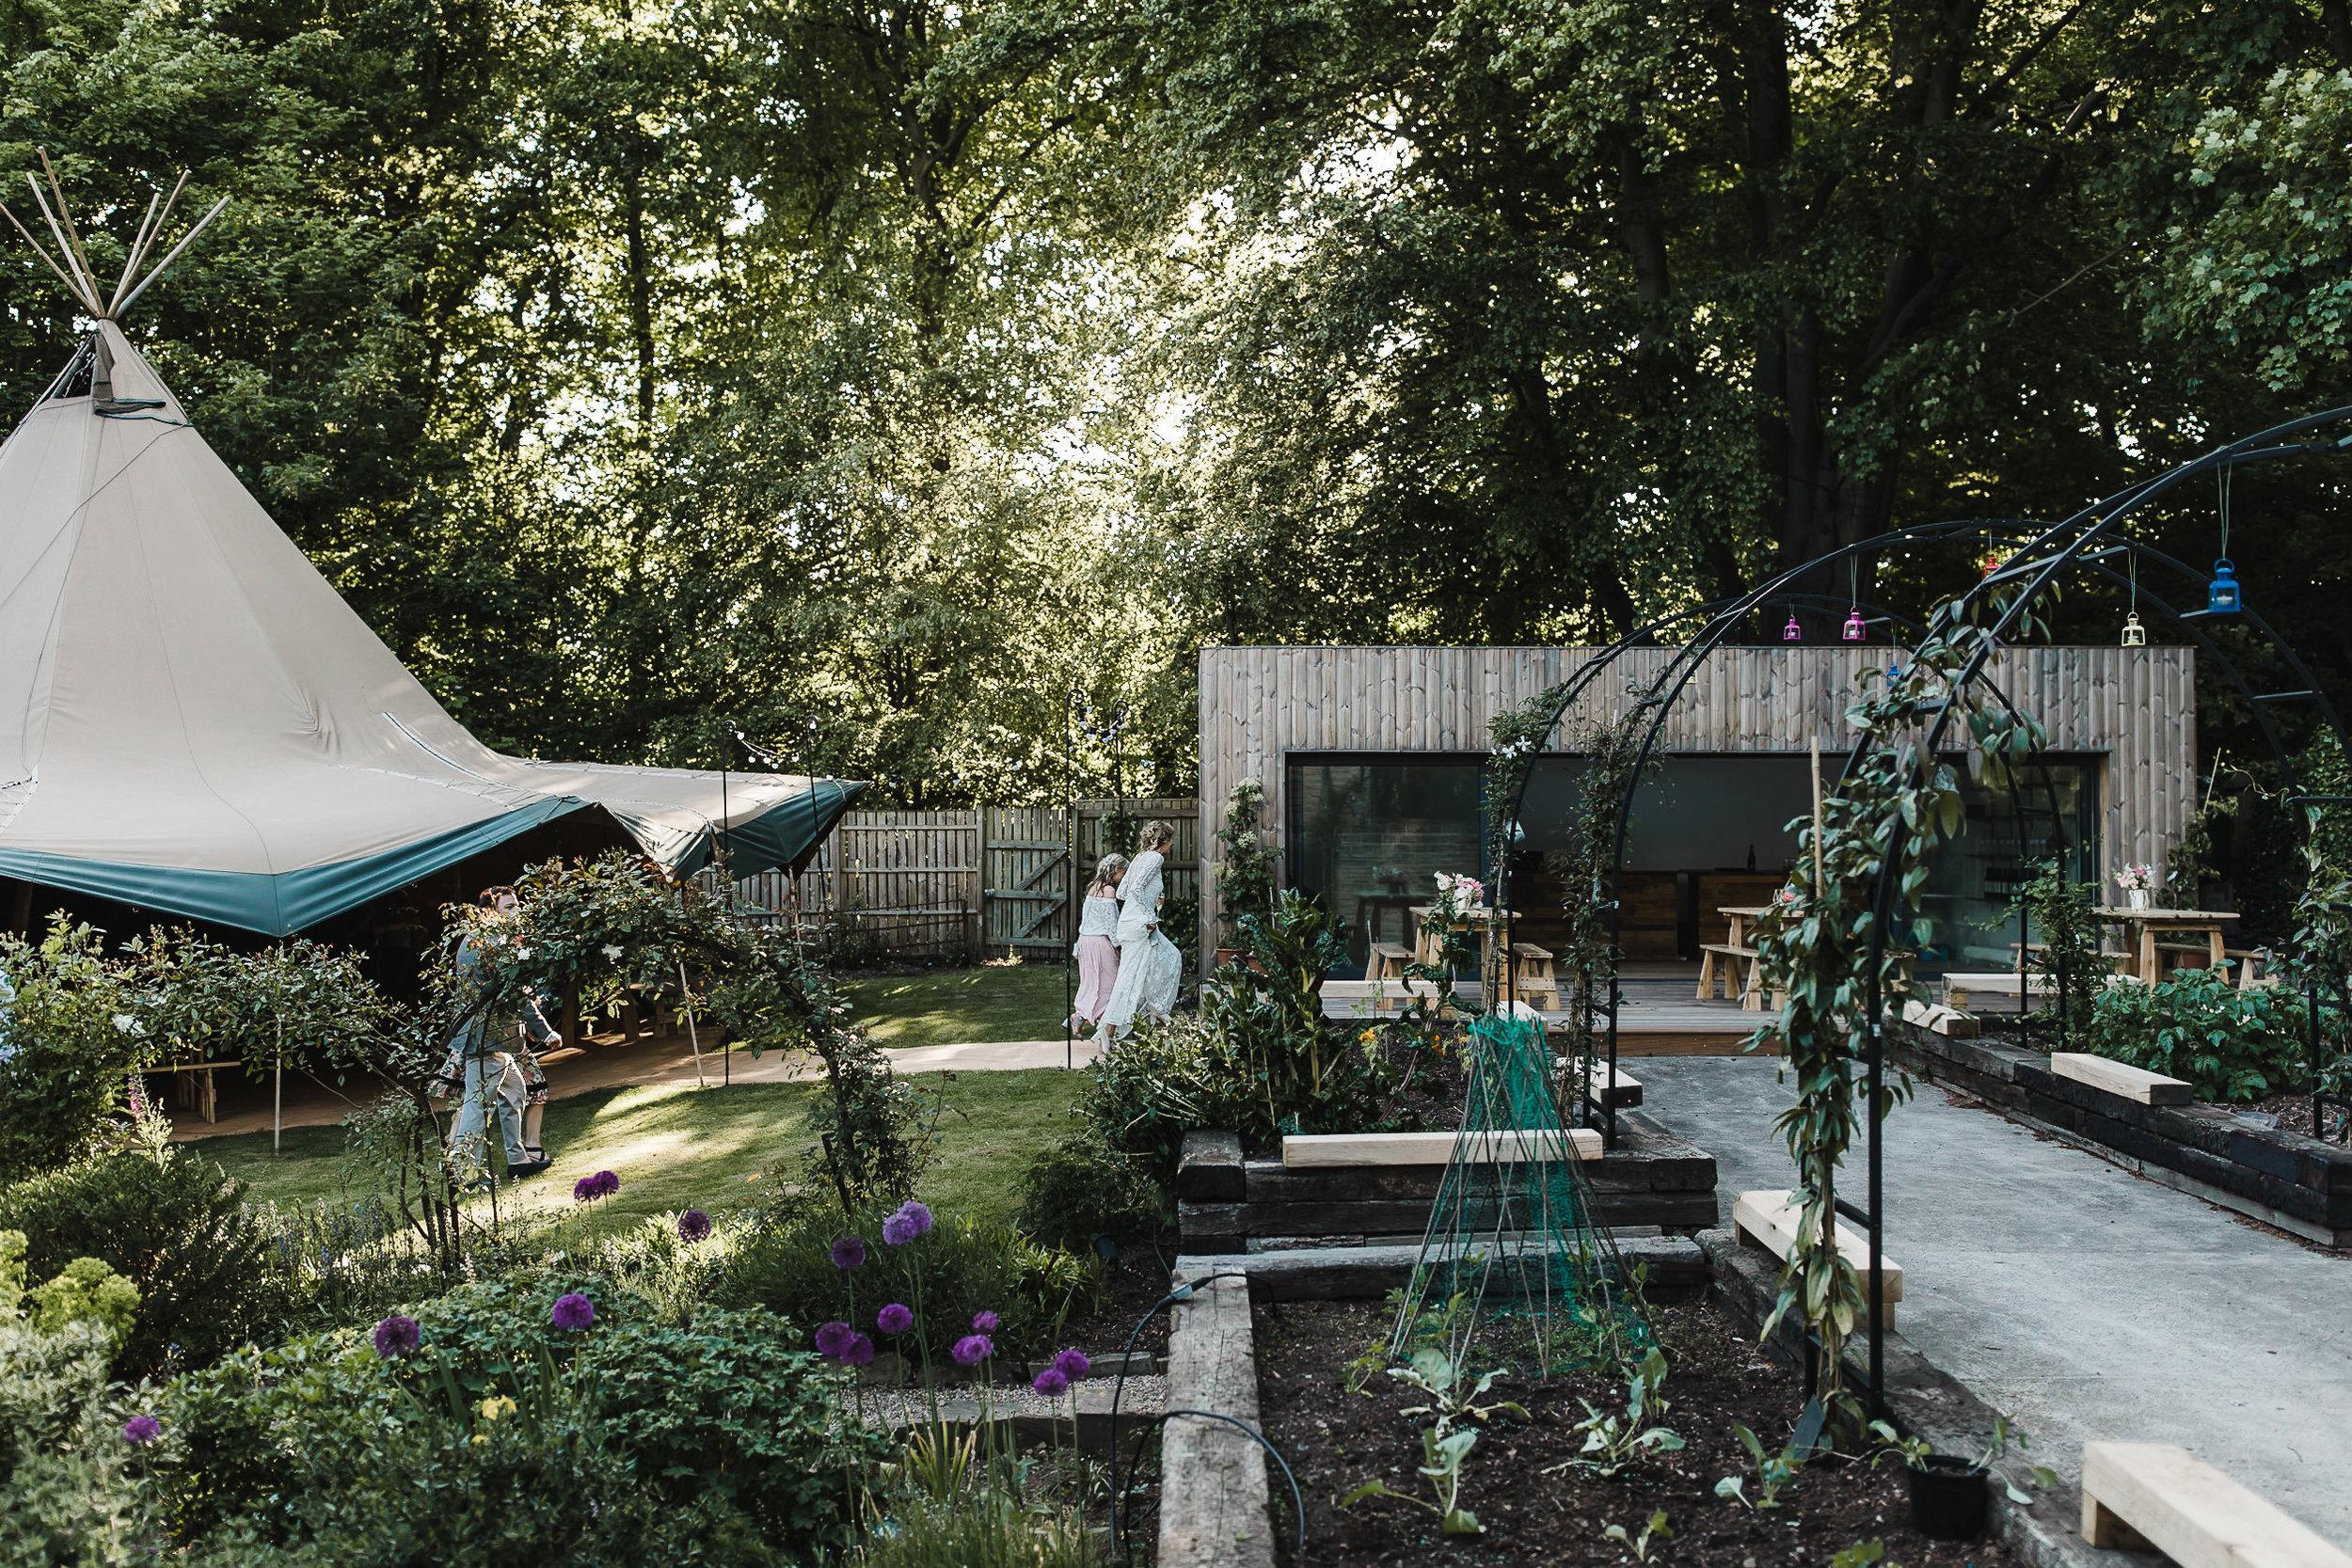 Roundhay-Leeds-Backyard-Wedding-Becs-Chris-200.jpg